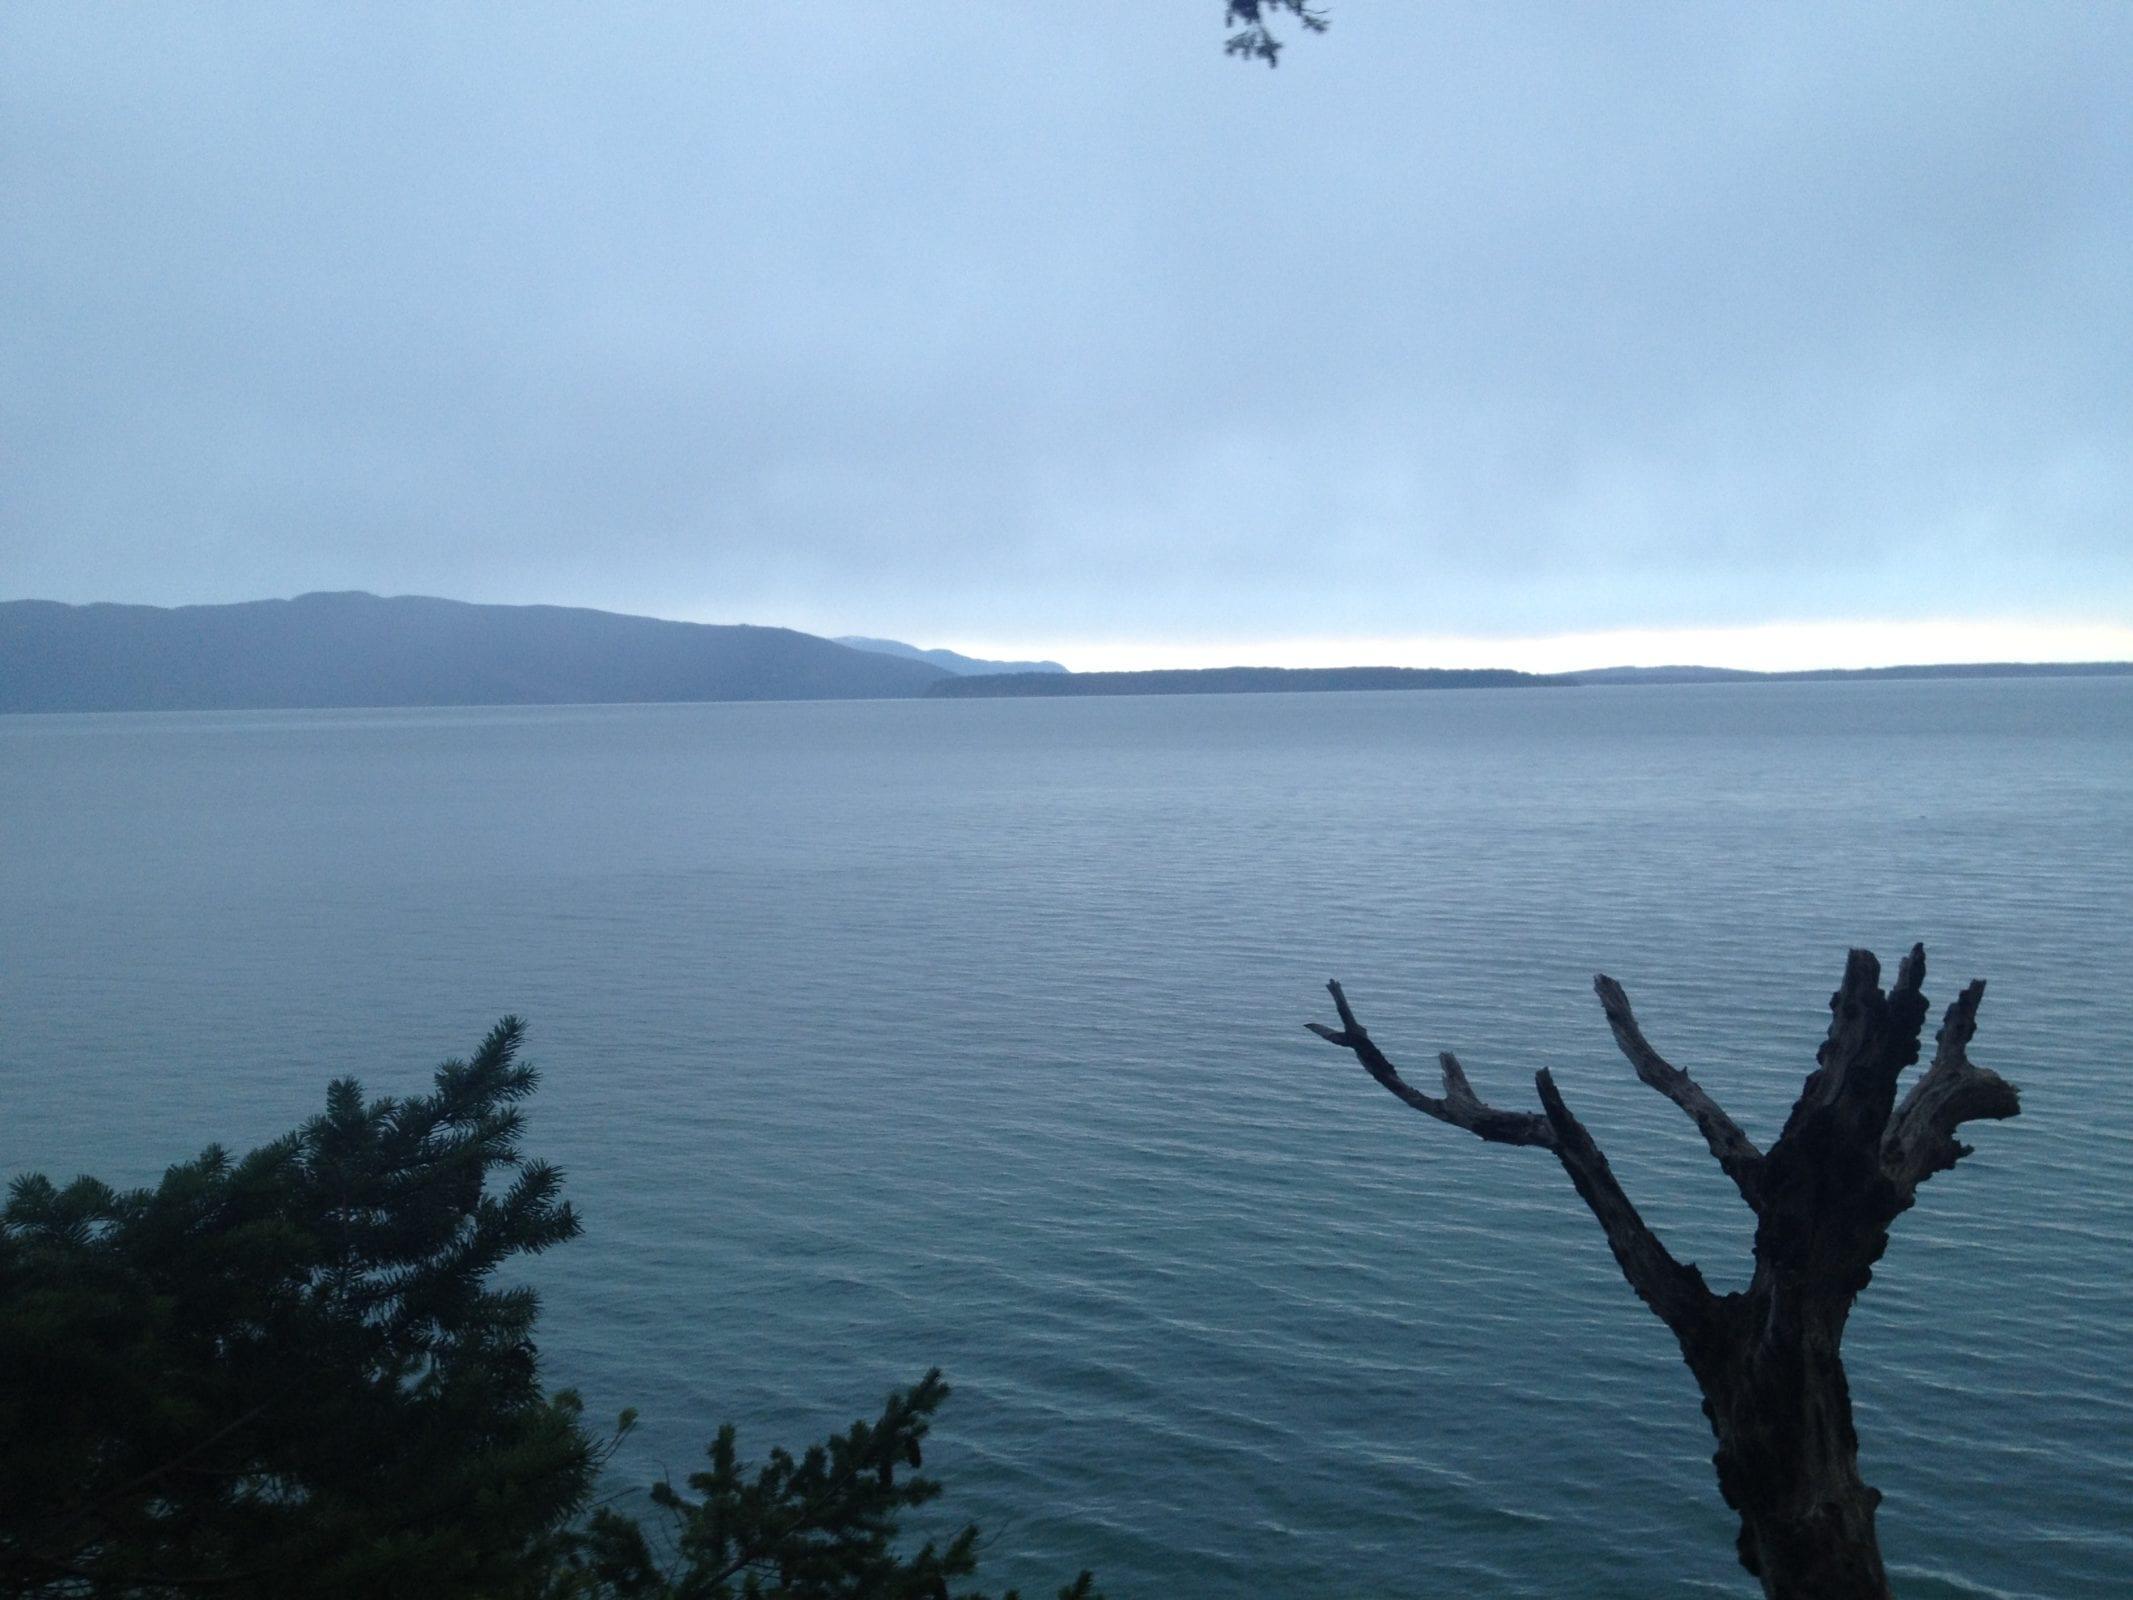 West Clark's Point view